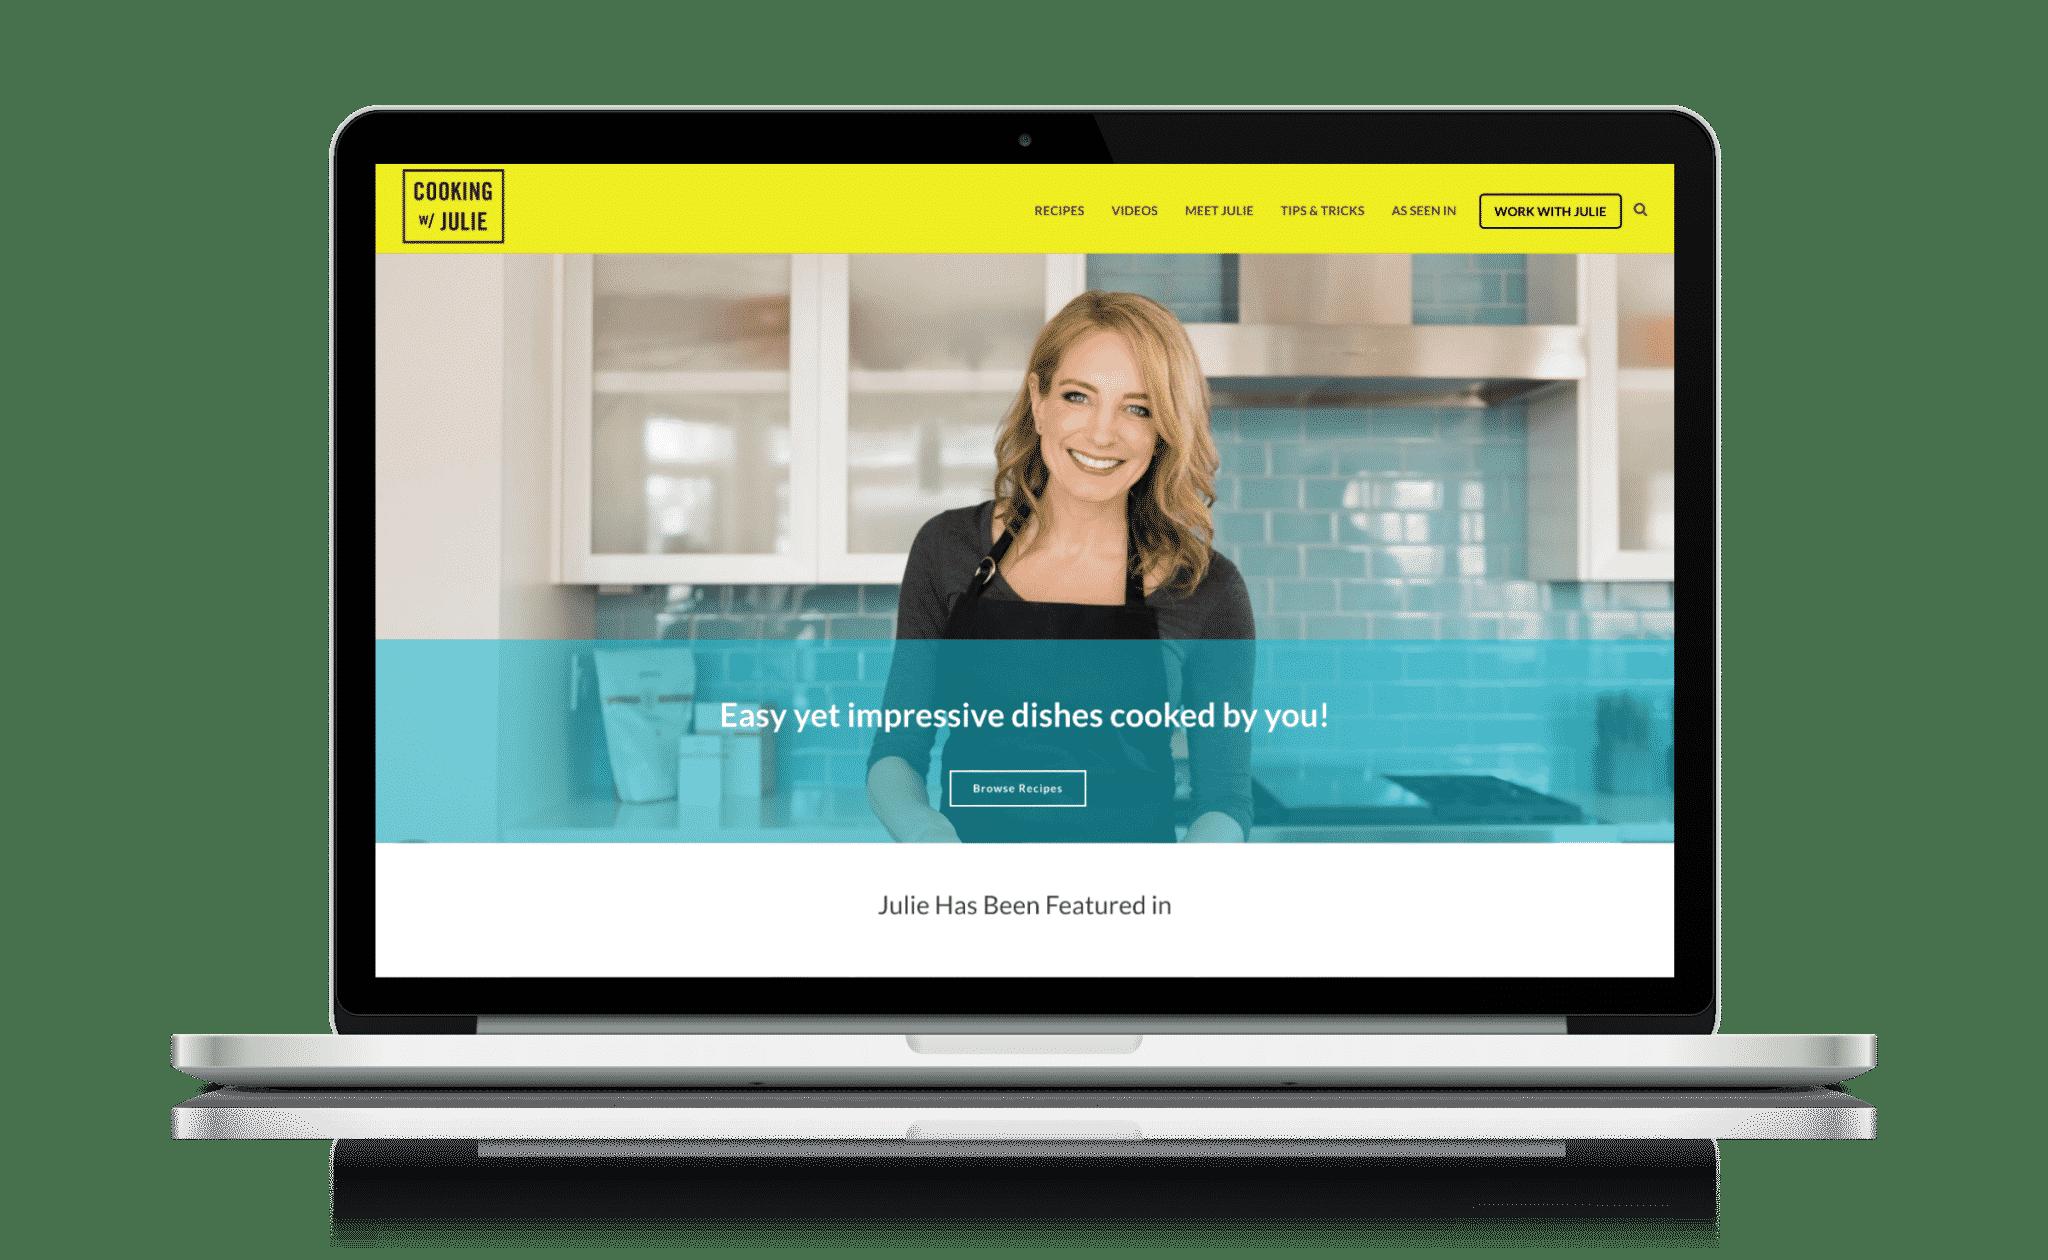 cwj-home-macbook